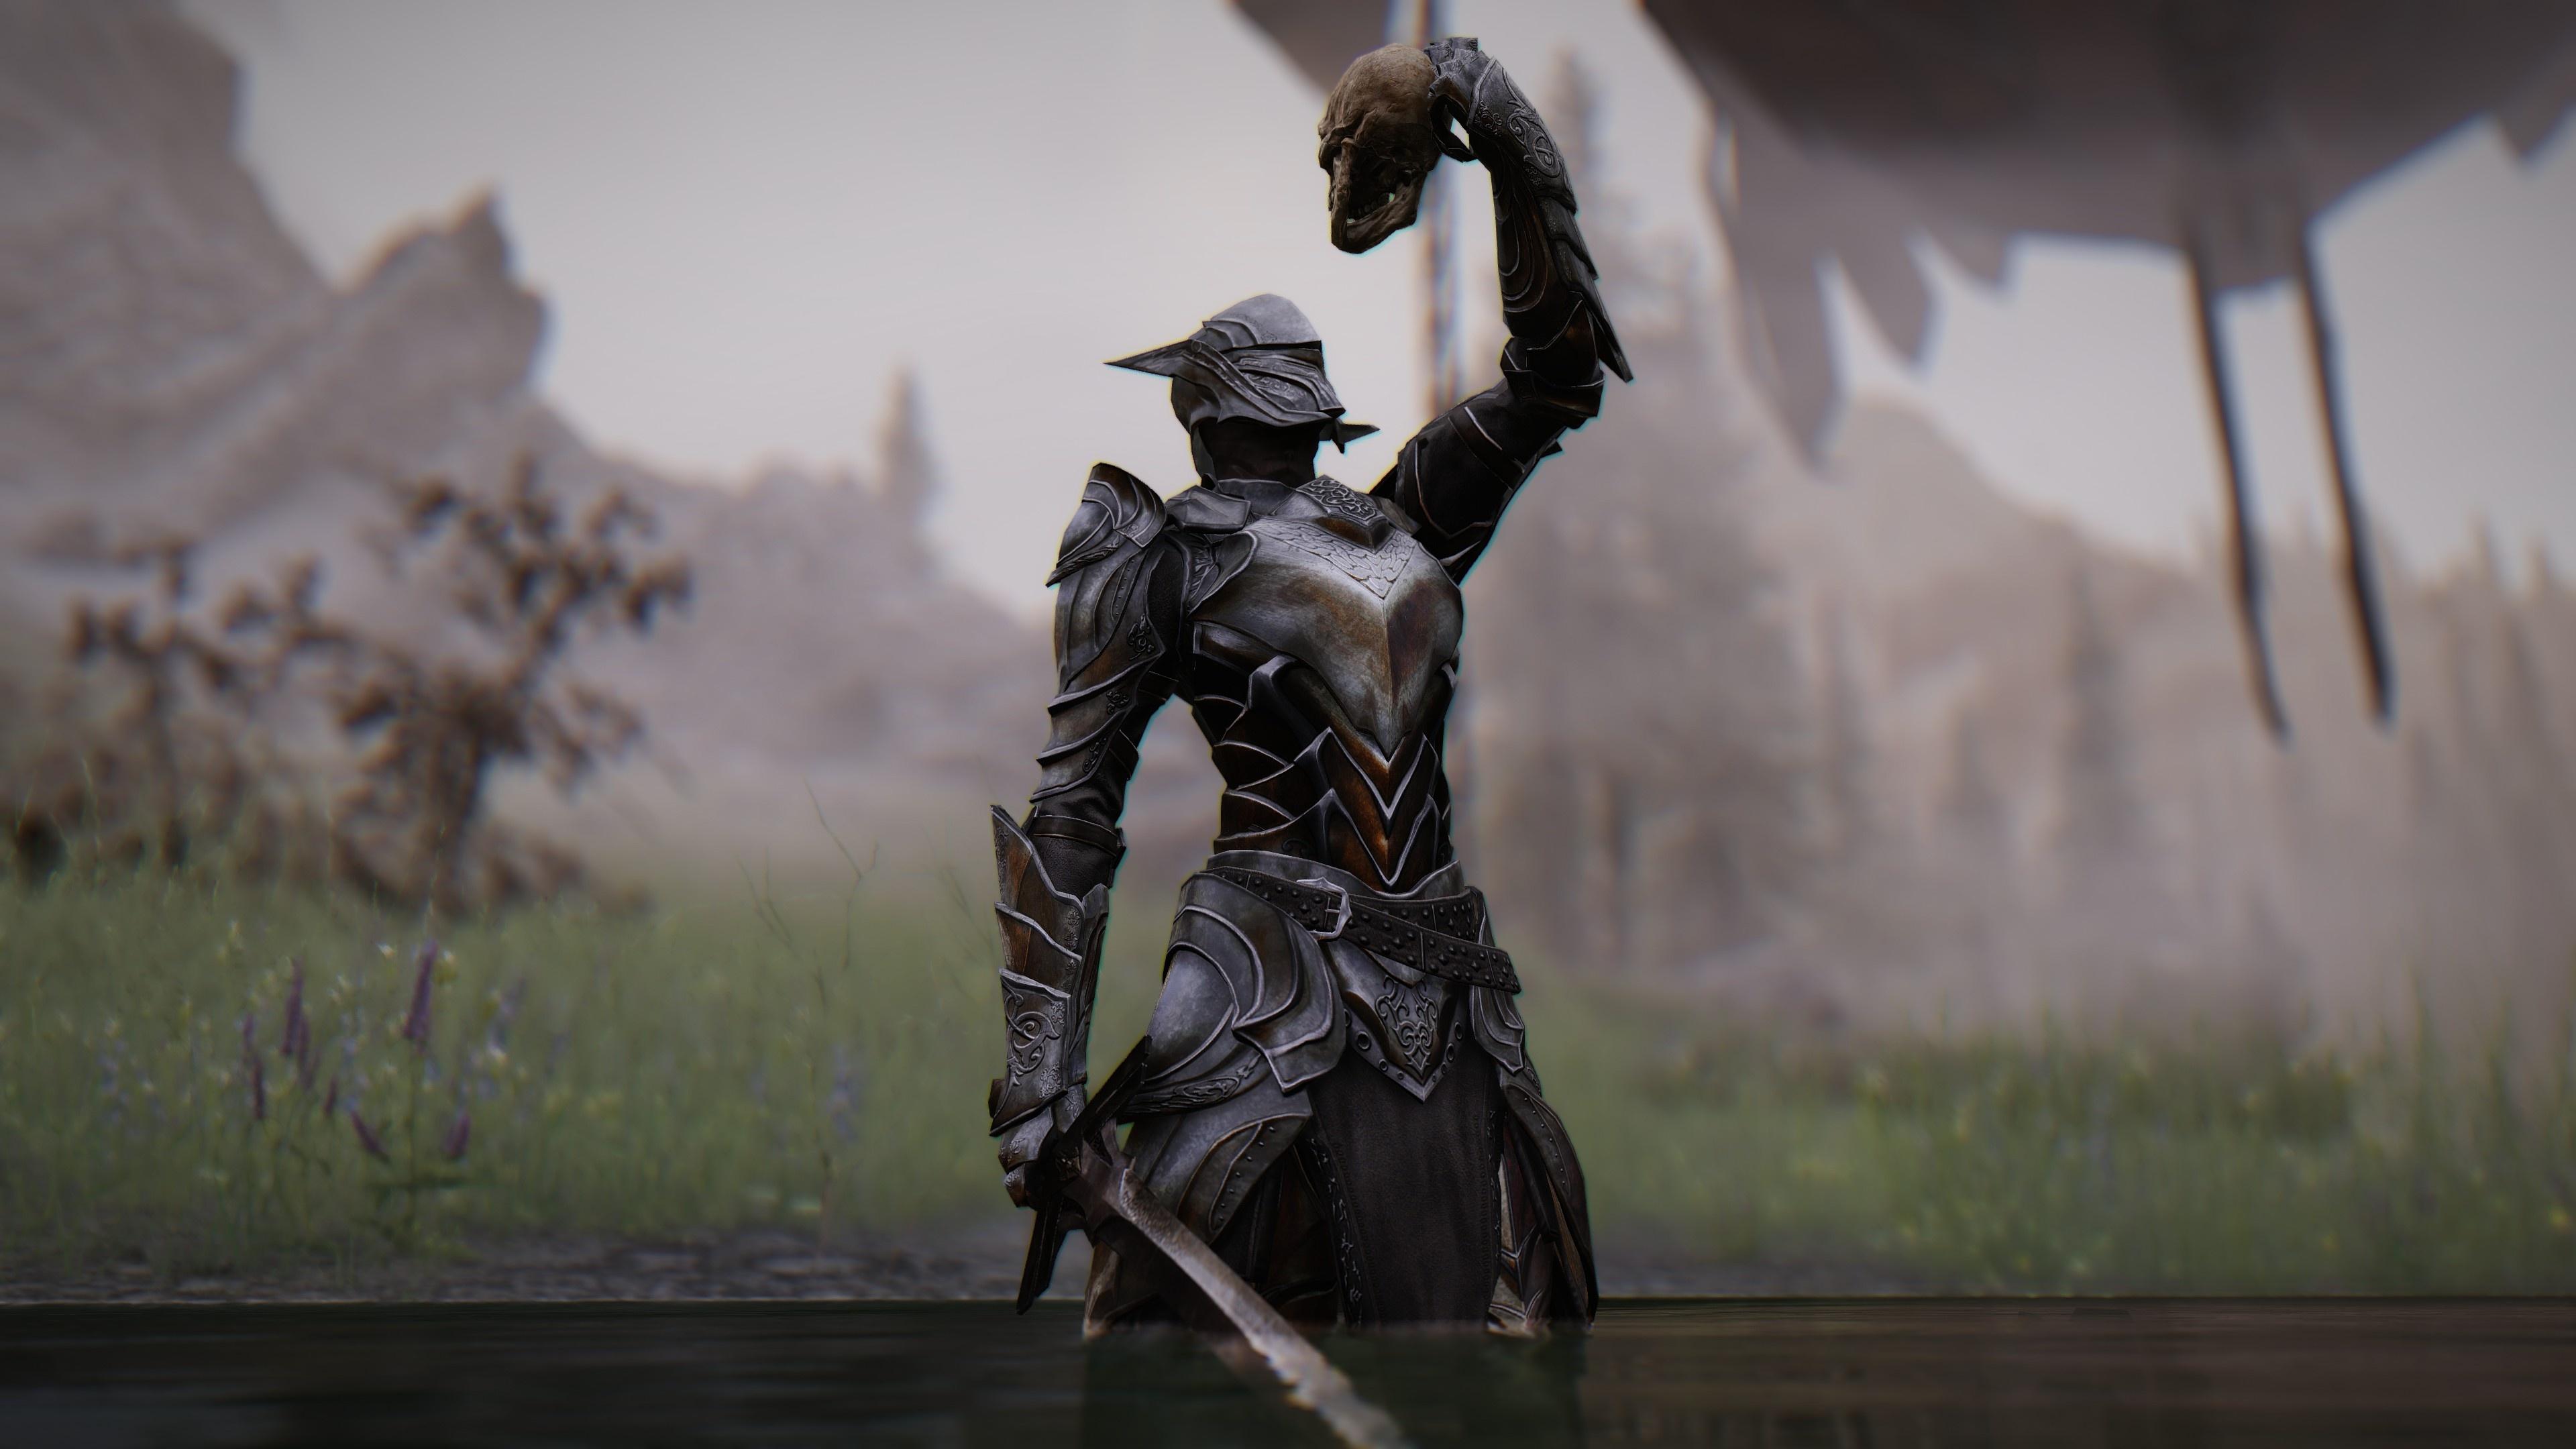 37205965-1573203167.jpg - The Elder Scrolls 5: Skyrim